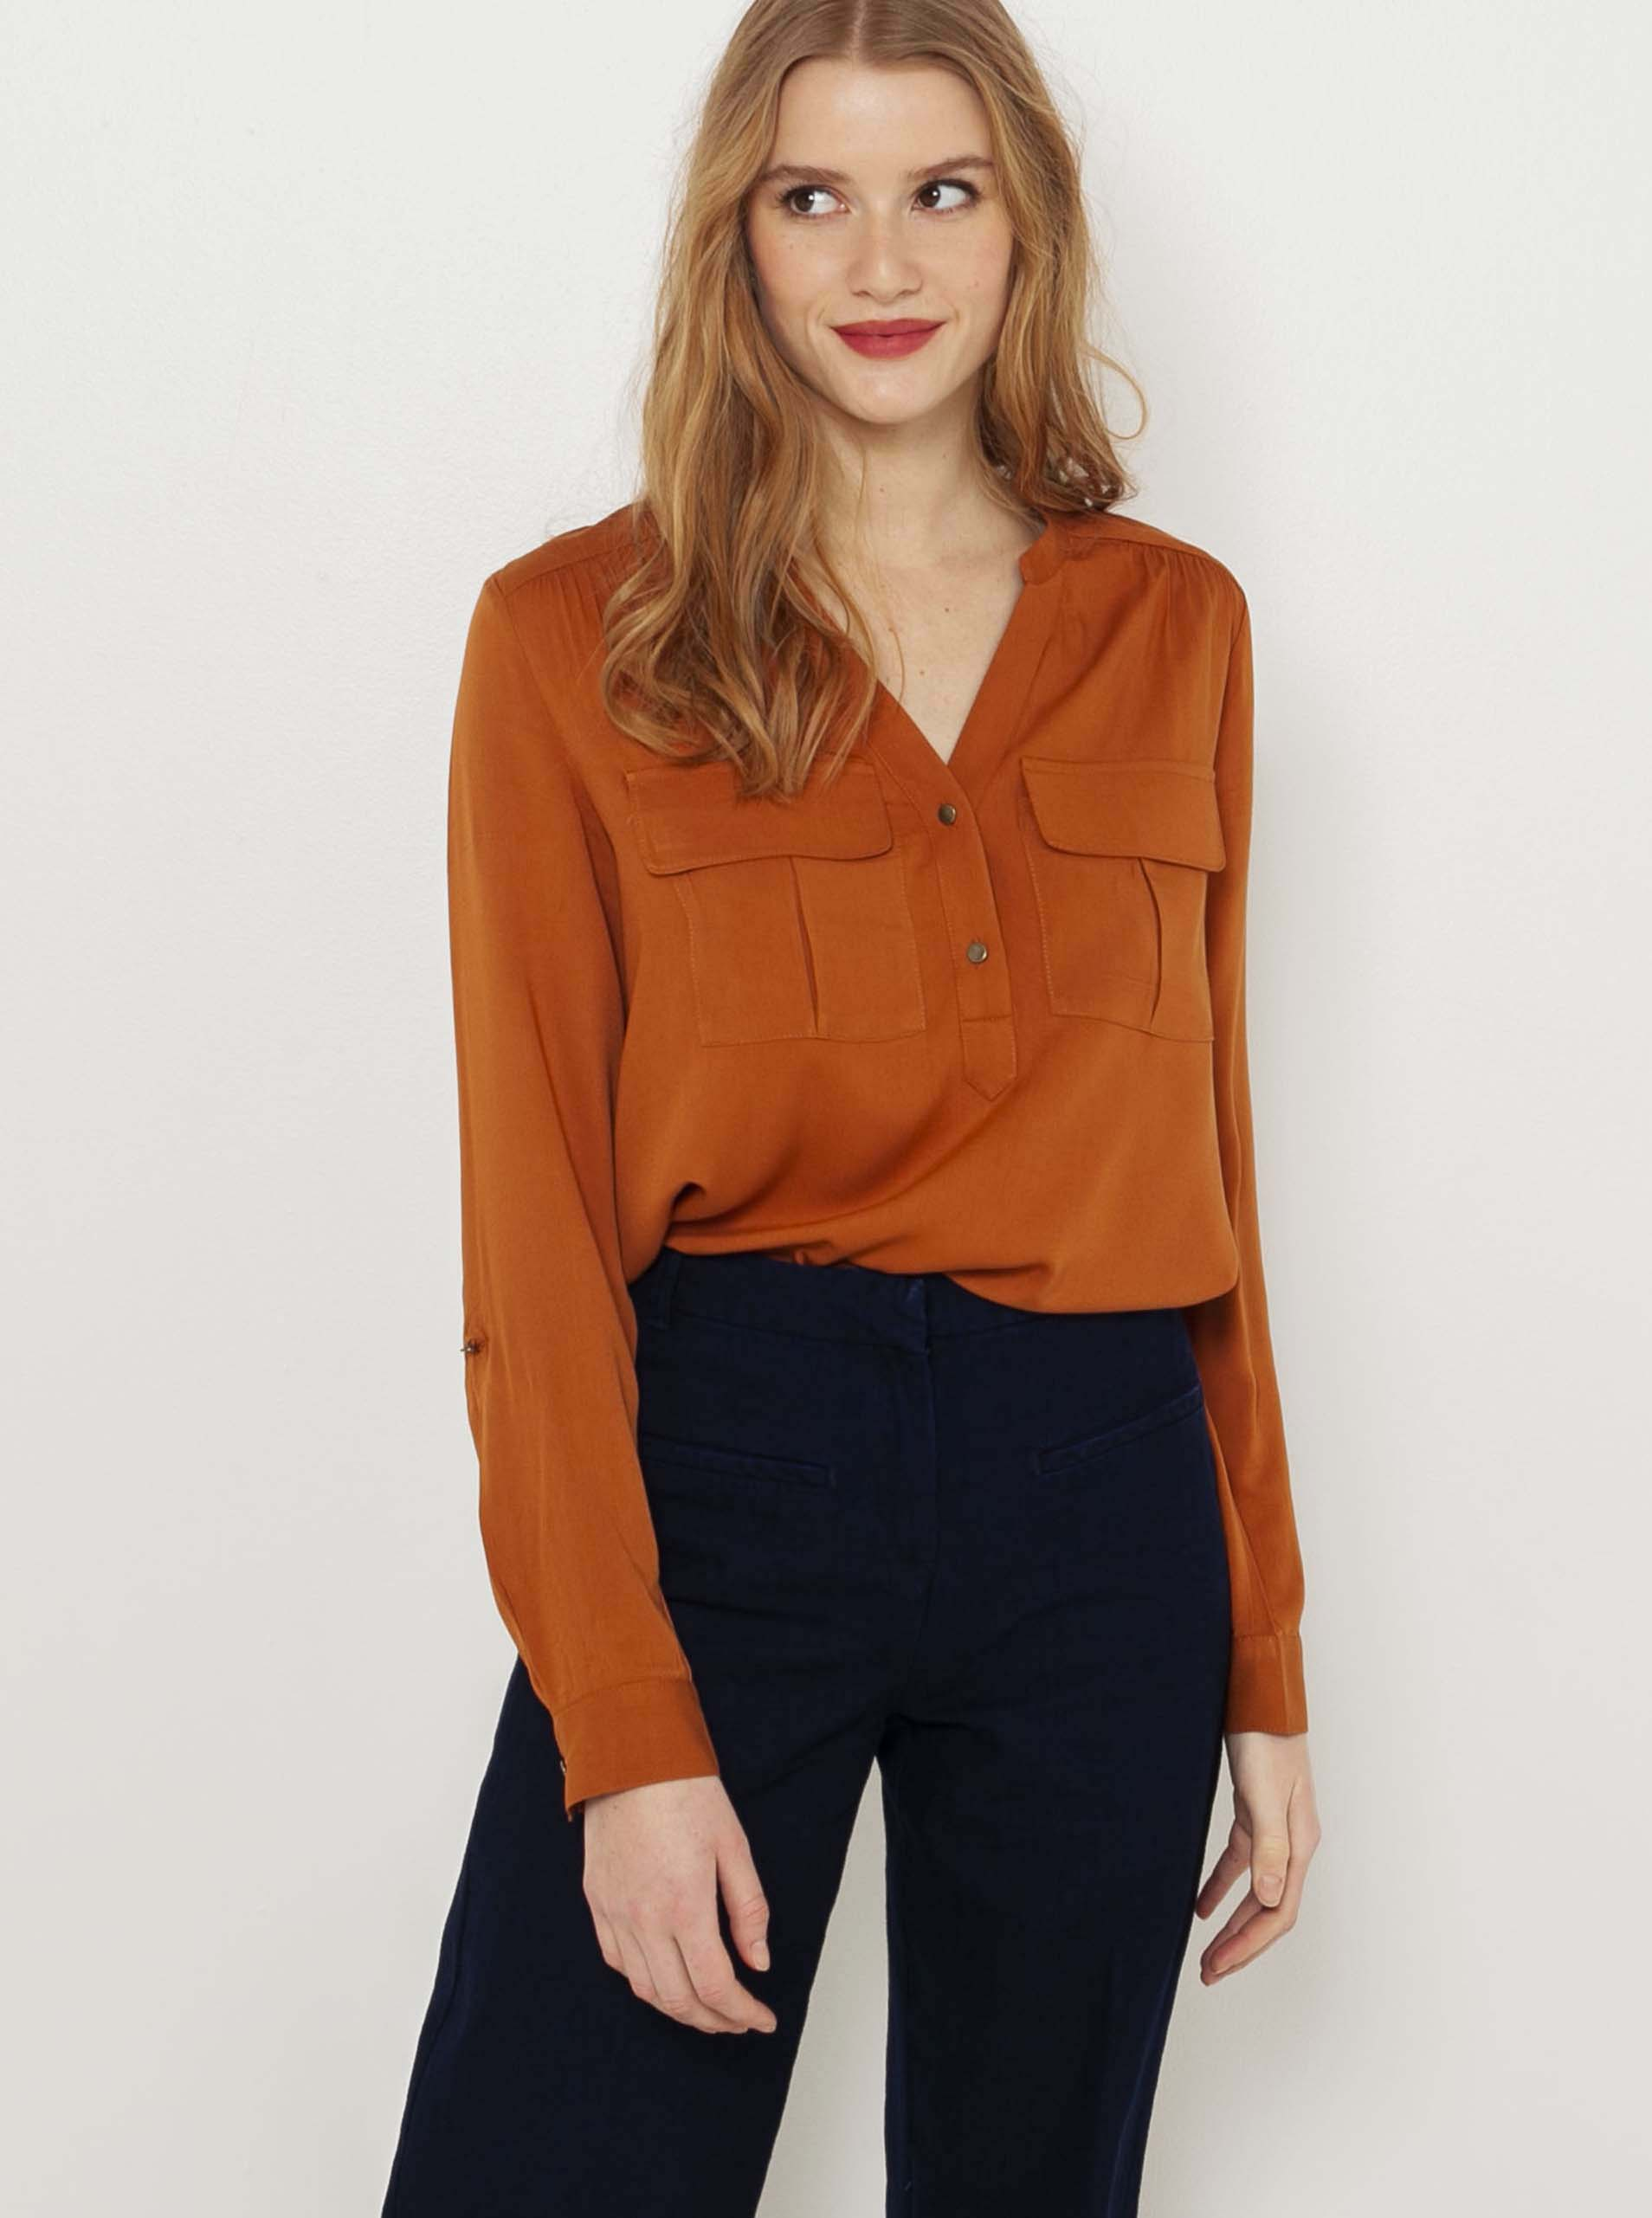 CAMAIEU maronii de dama bluză